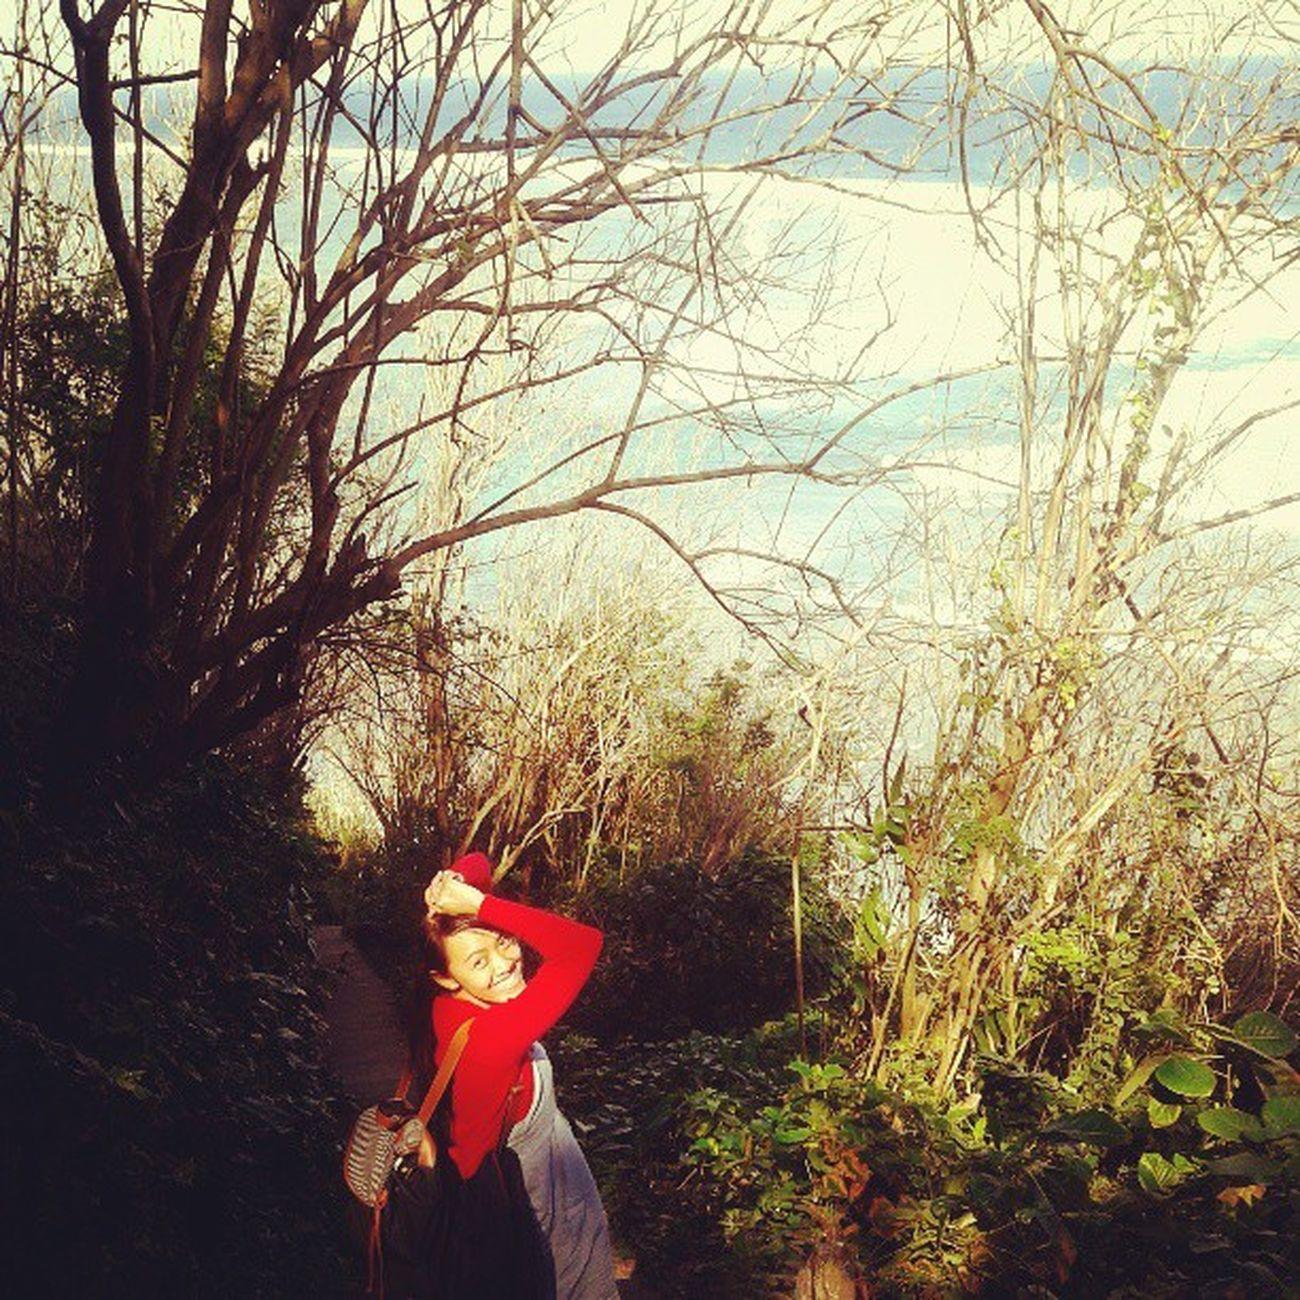 lets get lost Beach Lost Hiddenbeach Vietnam Sky Instasky Landscape Instalandscape Instanusantarabali Instanusantara Instanesia Ighub Instagood Instadaily Picoftheday Photooftheday Instabeach Bali INDONESIA LangitbaliPhotoworks